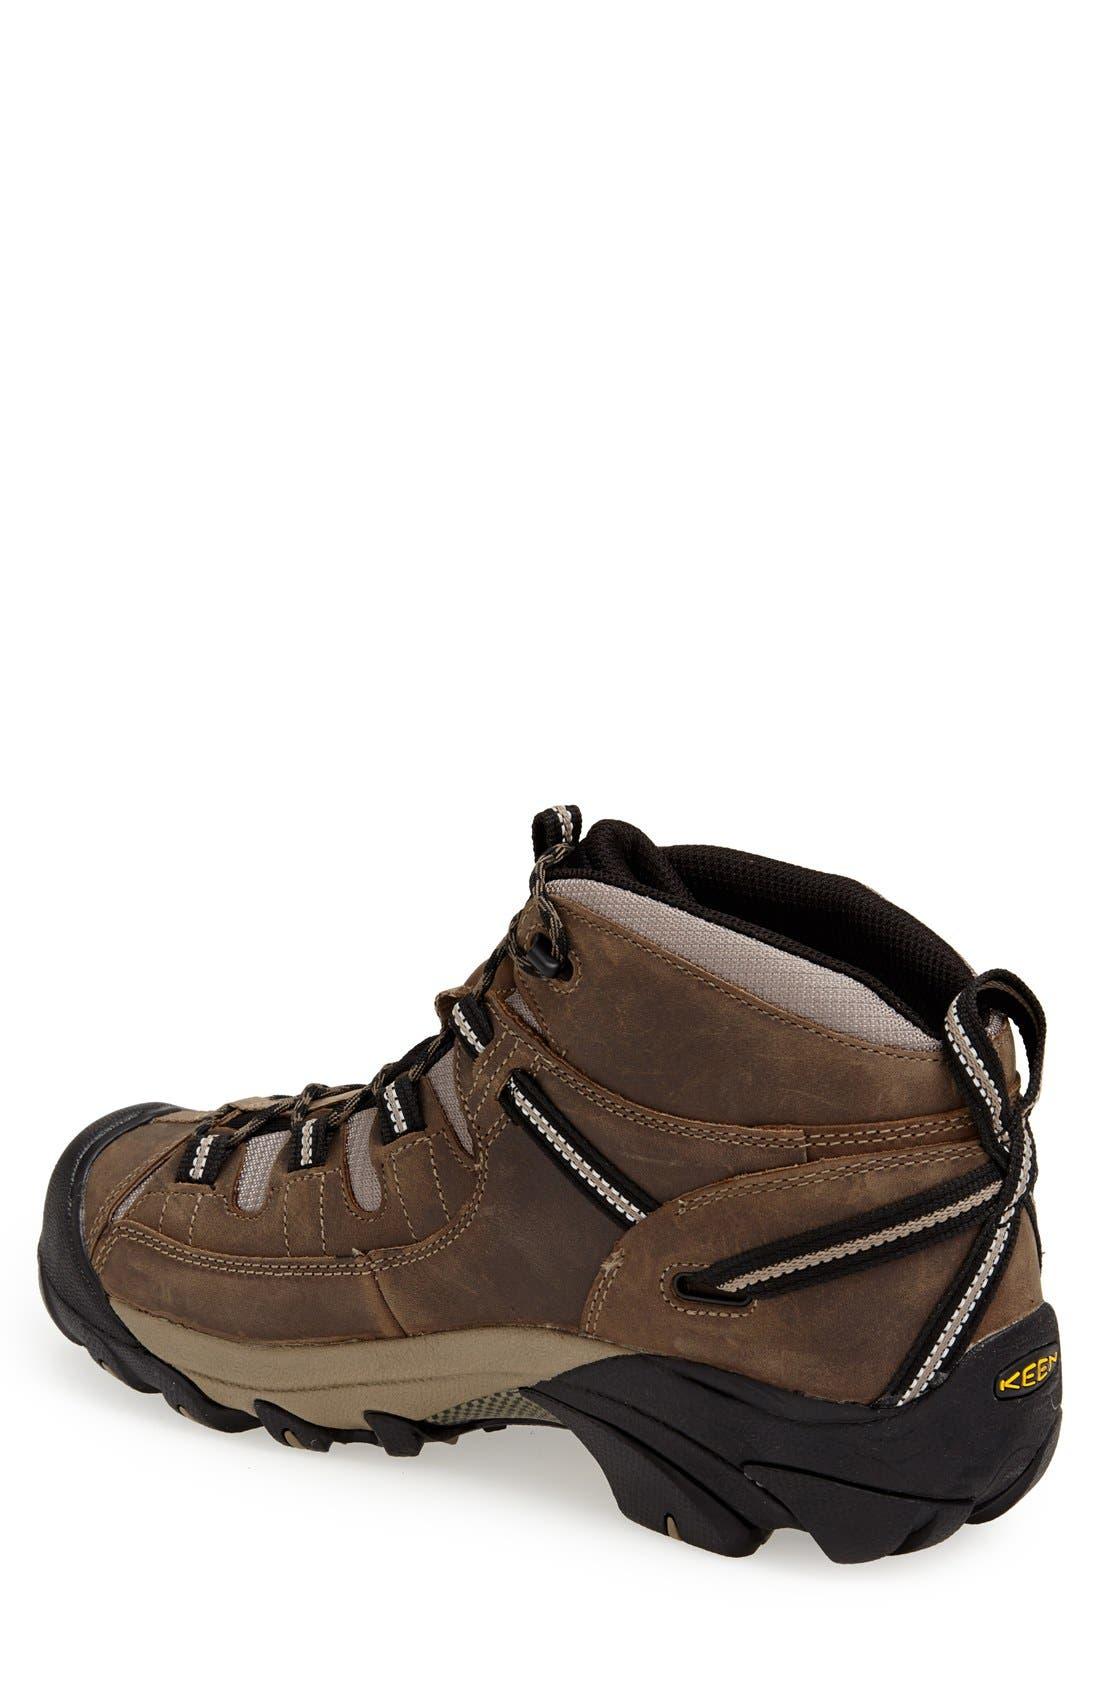 Targhee II Mid Hiking Waterproof Boot,                             Alternate thumbnail 2, color,                             SHITAKE/ BRINDLE